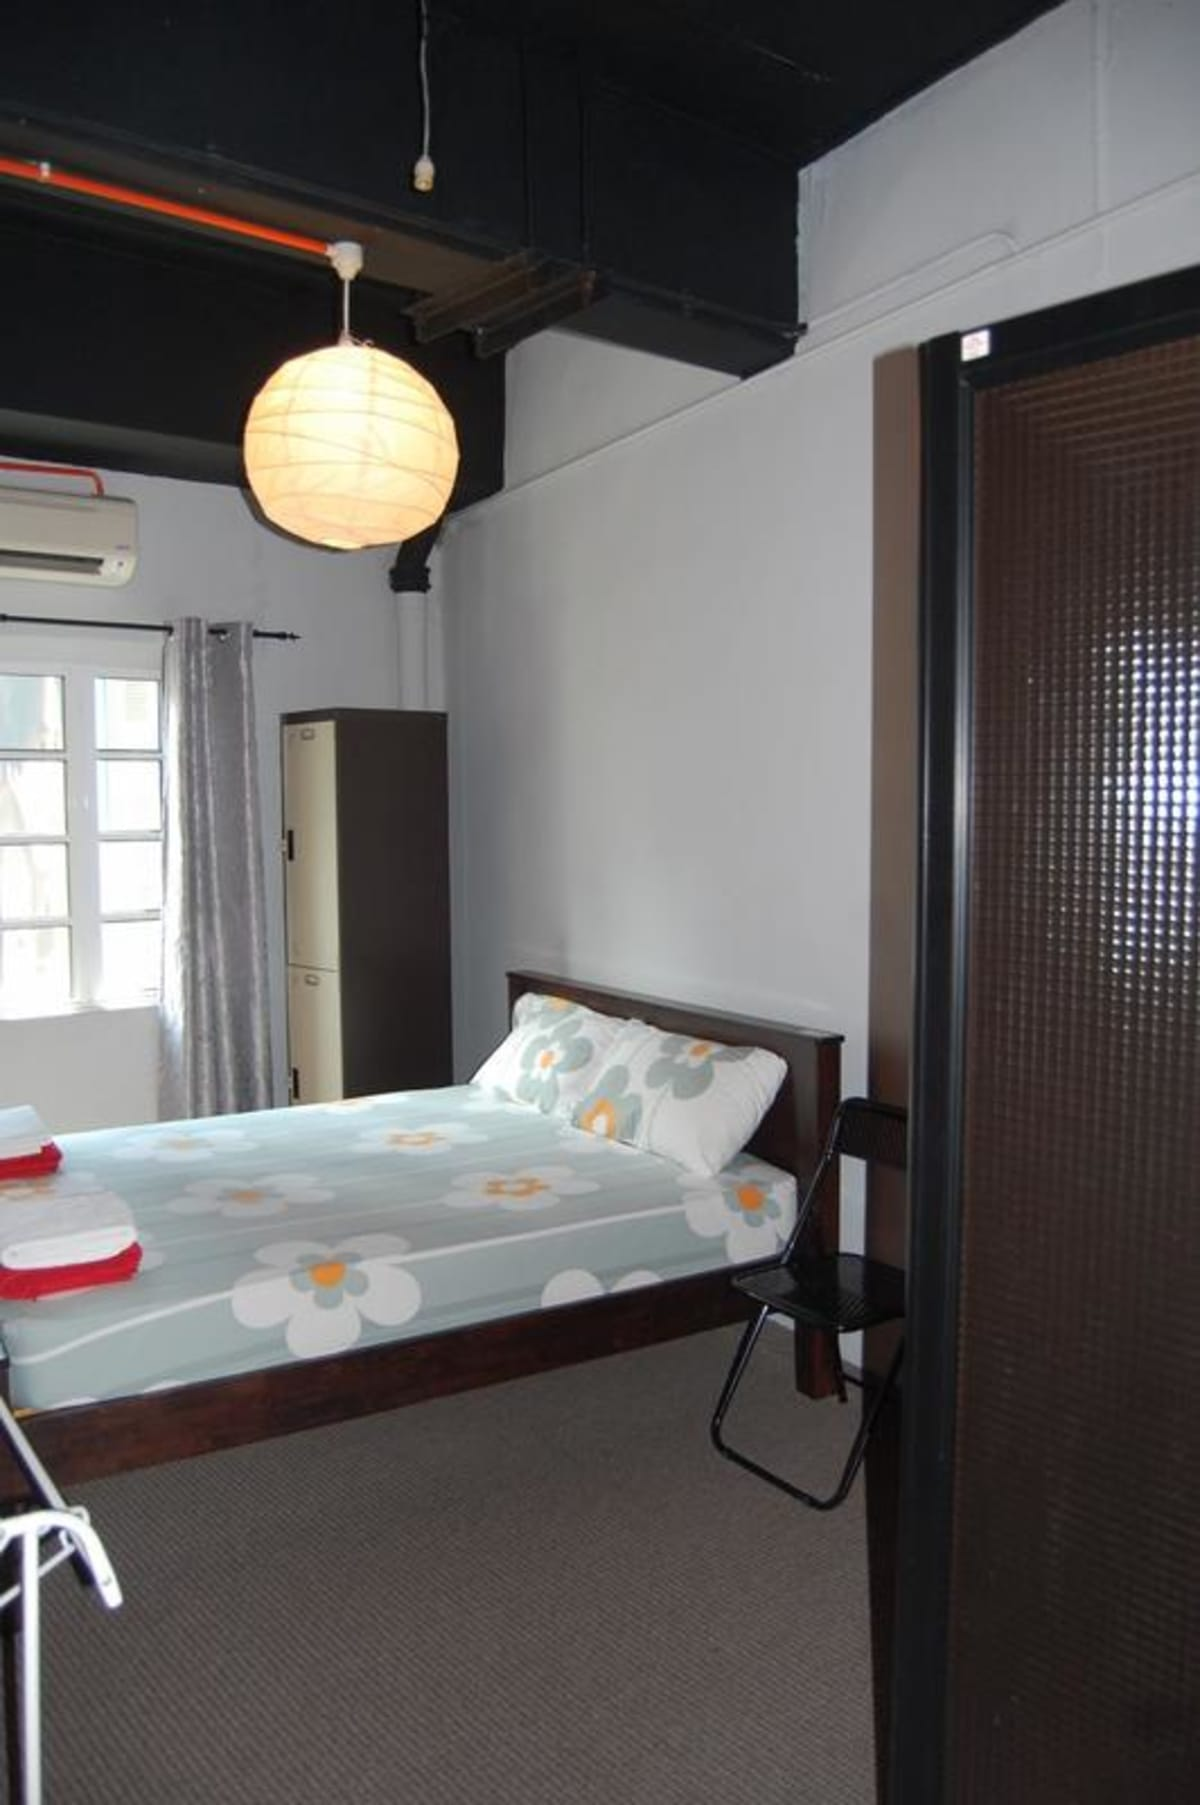 Sunshine Bedz KL, Kuala Lumpur, Malaysia hostel